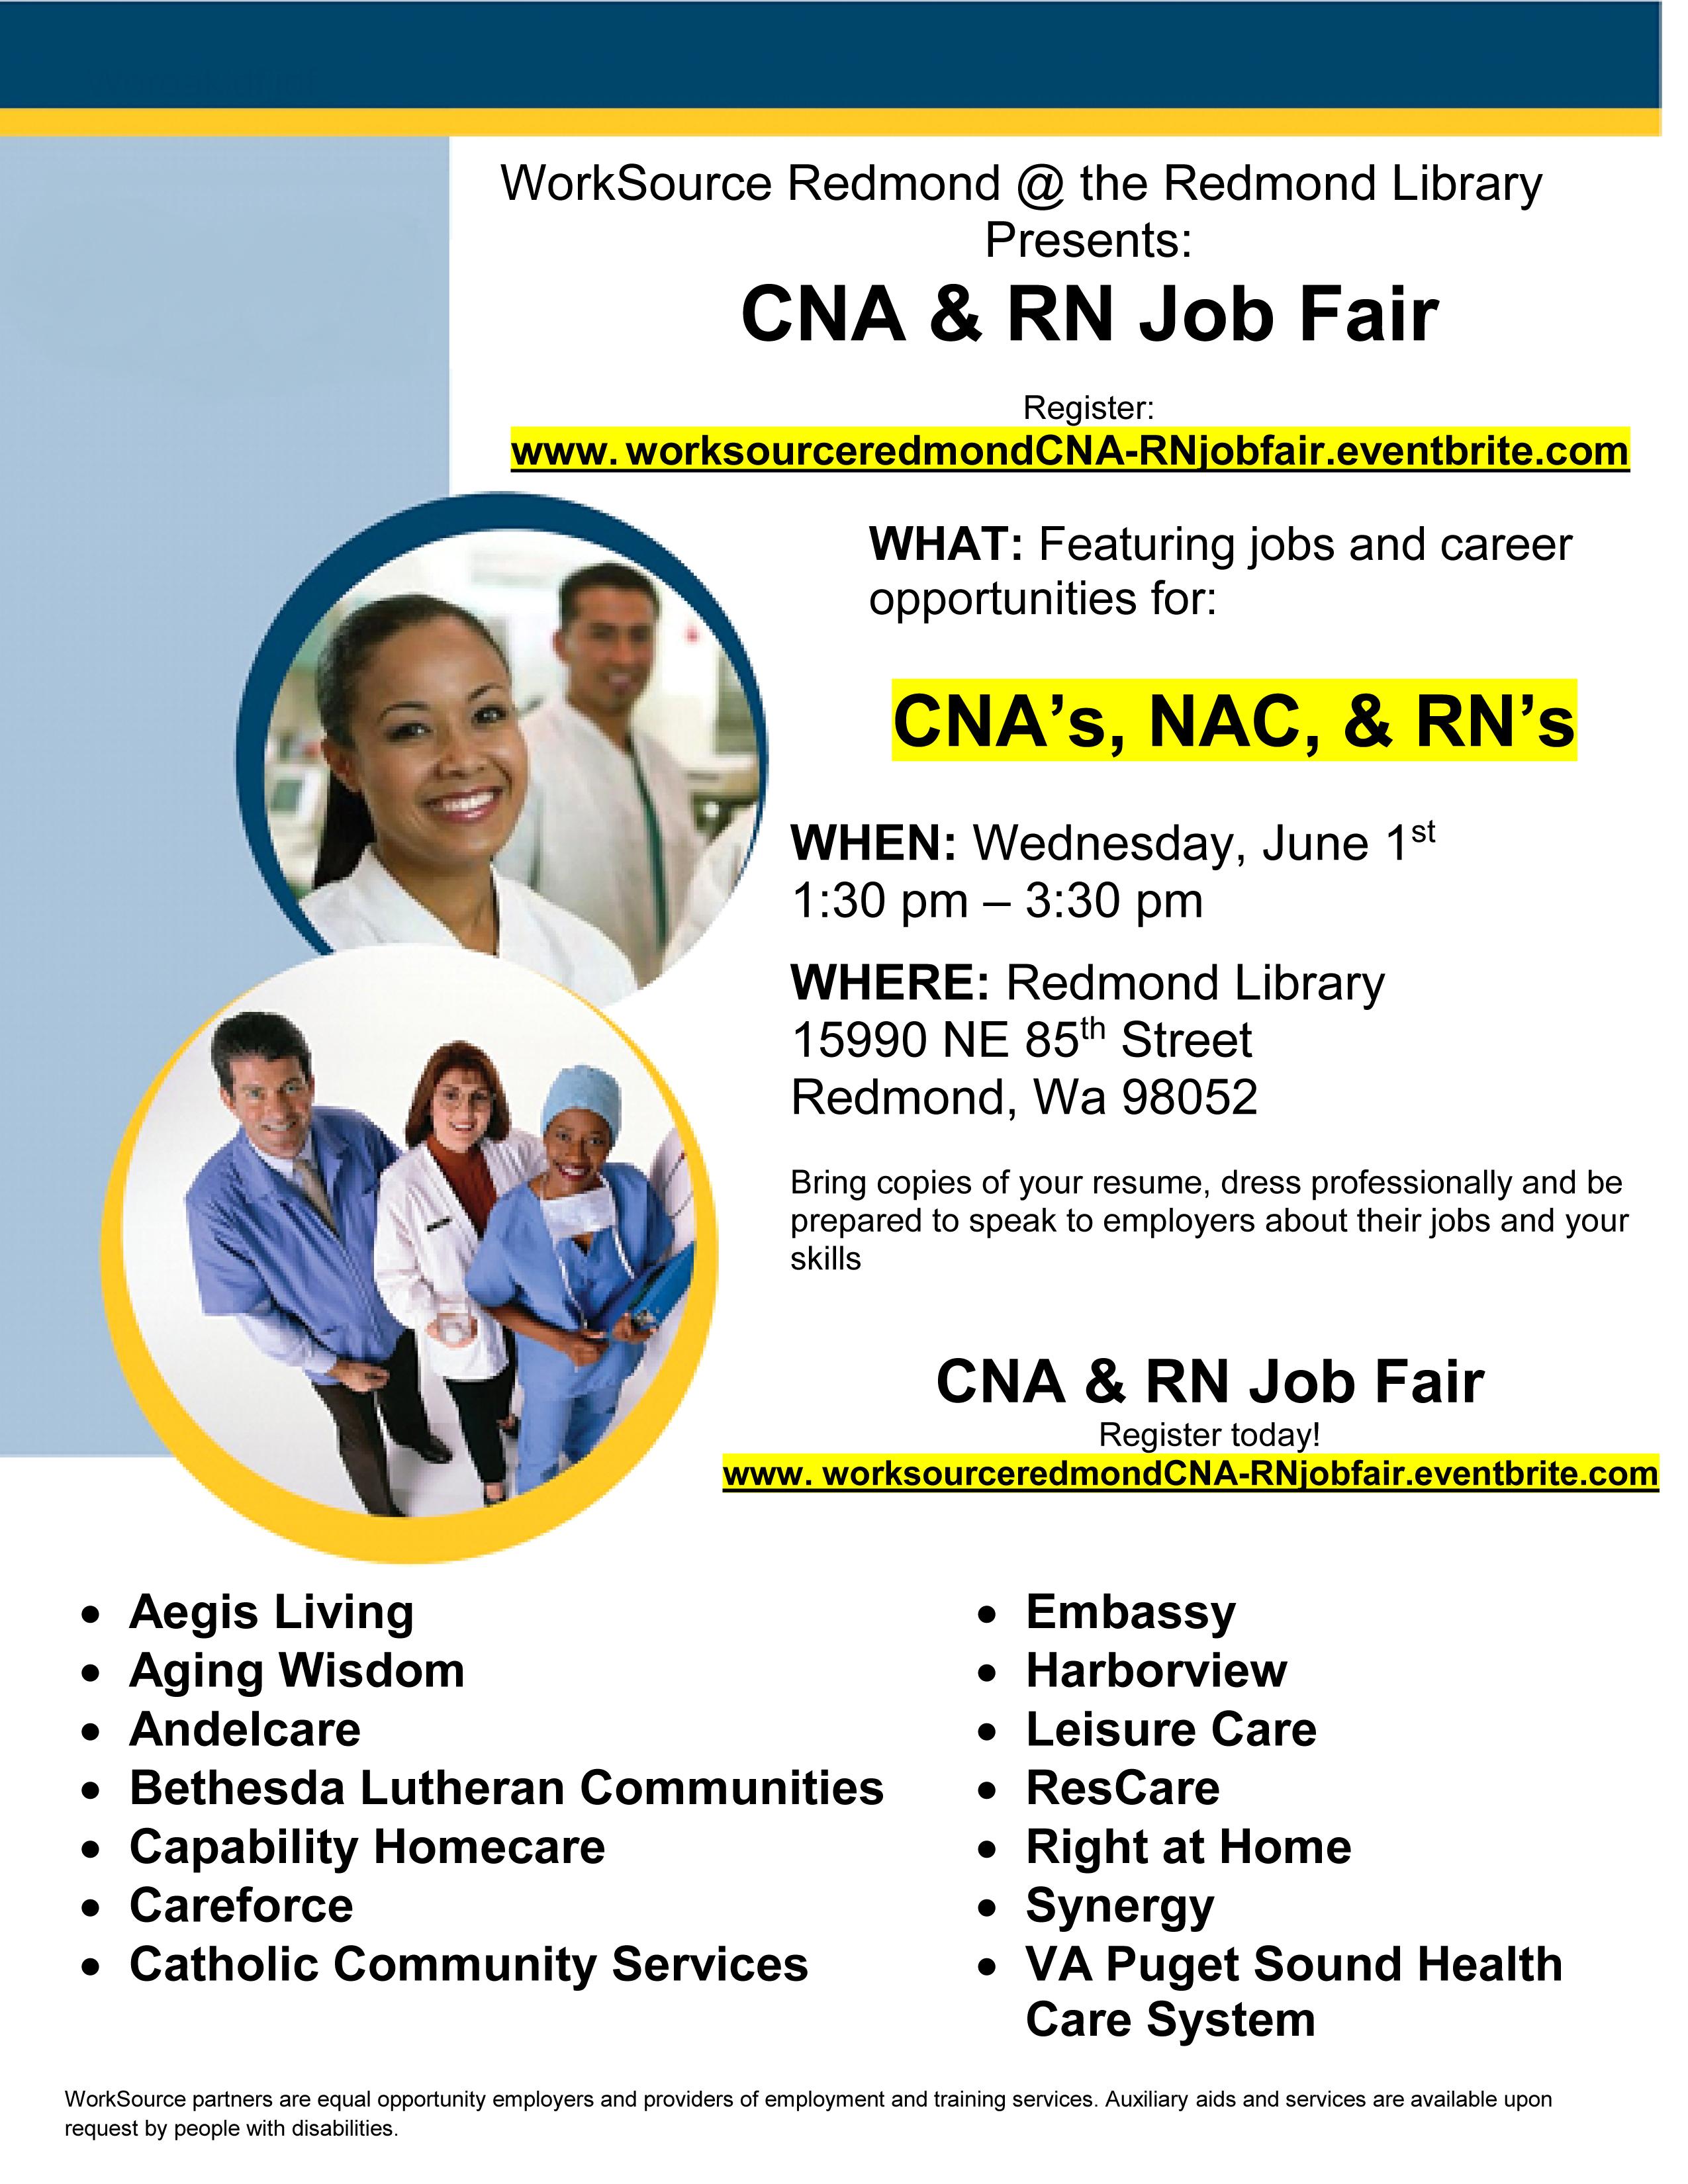 6-1 CNA & RN Job Fair